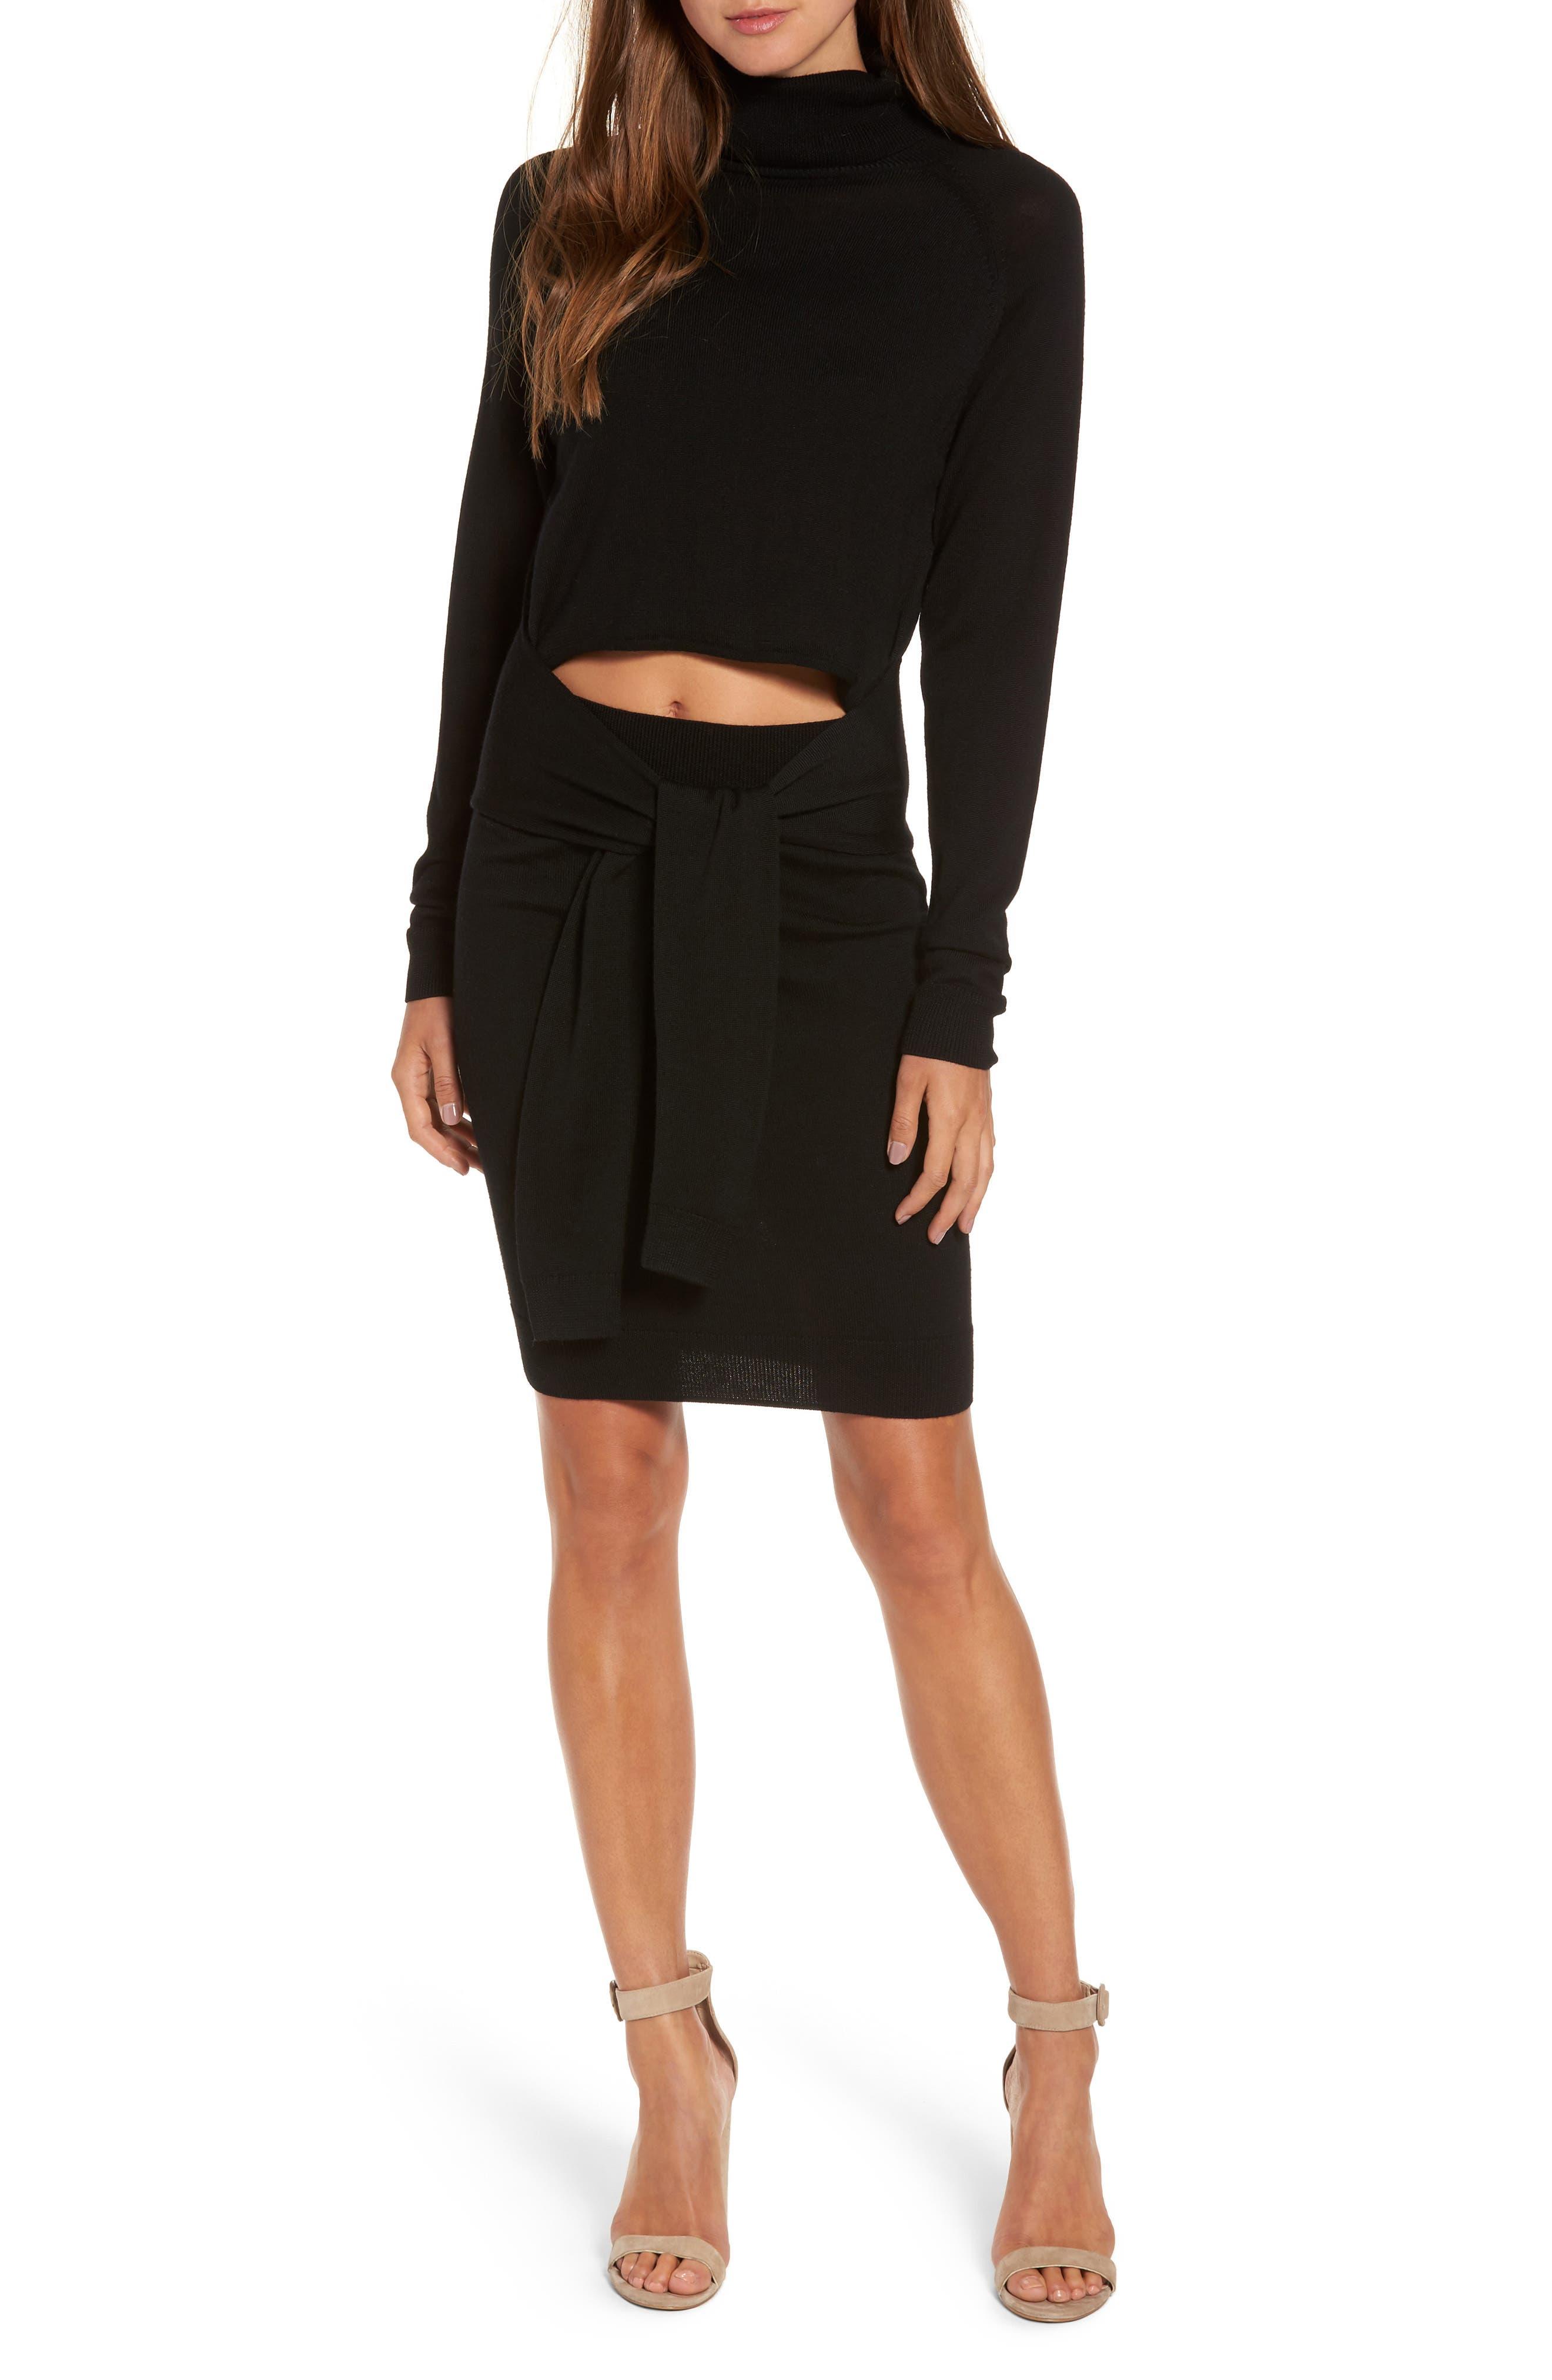 Alternate Image 1 Selected - KENDALL + KYLIE Tie Front Turtleneck Dress